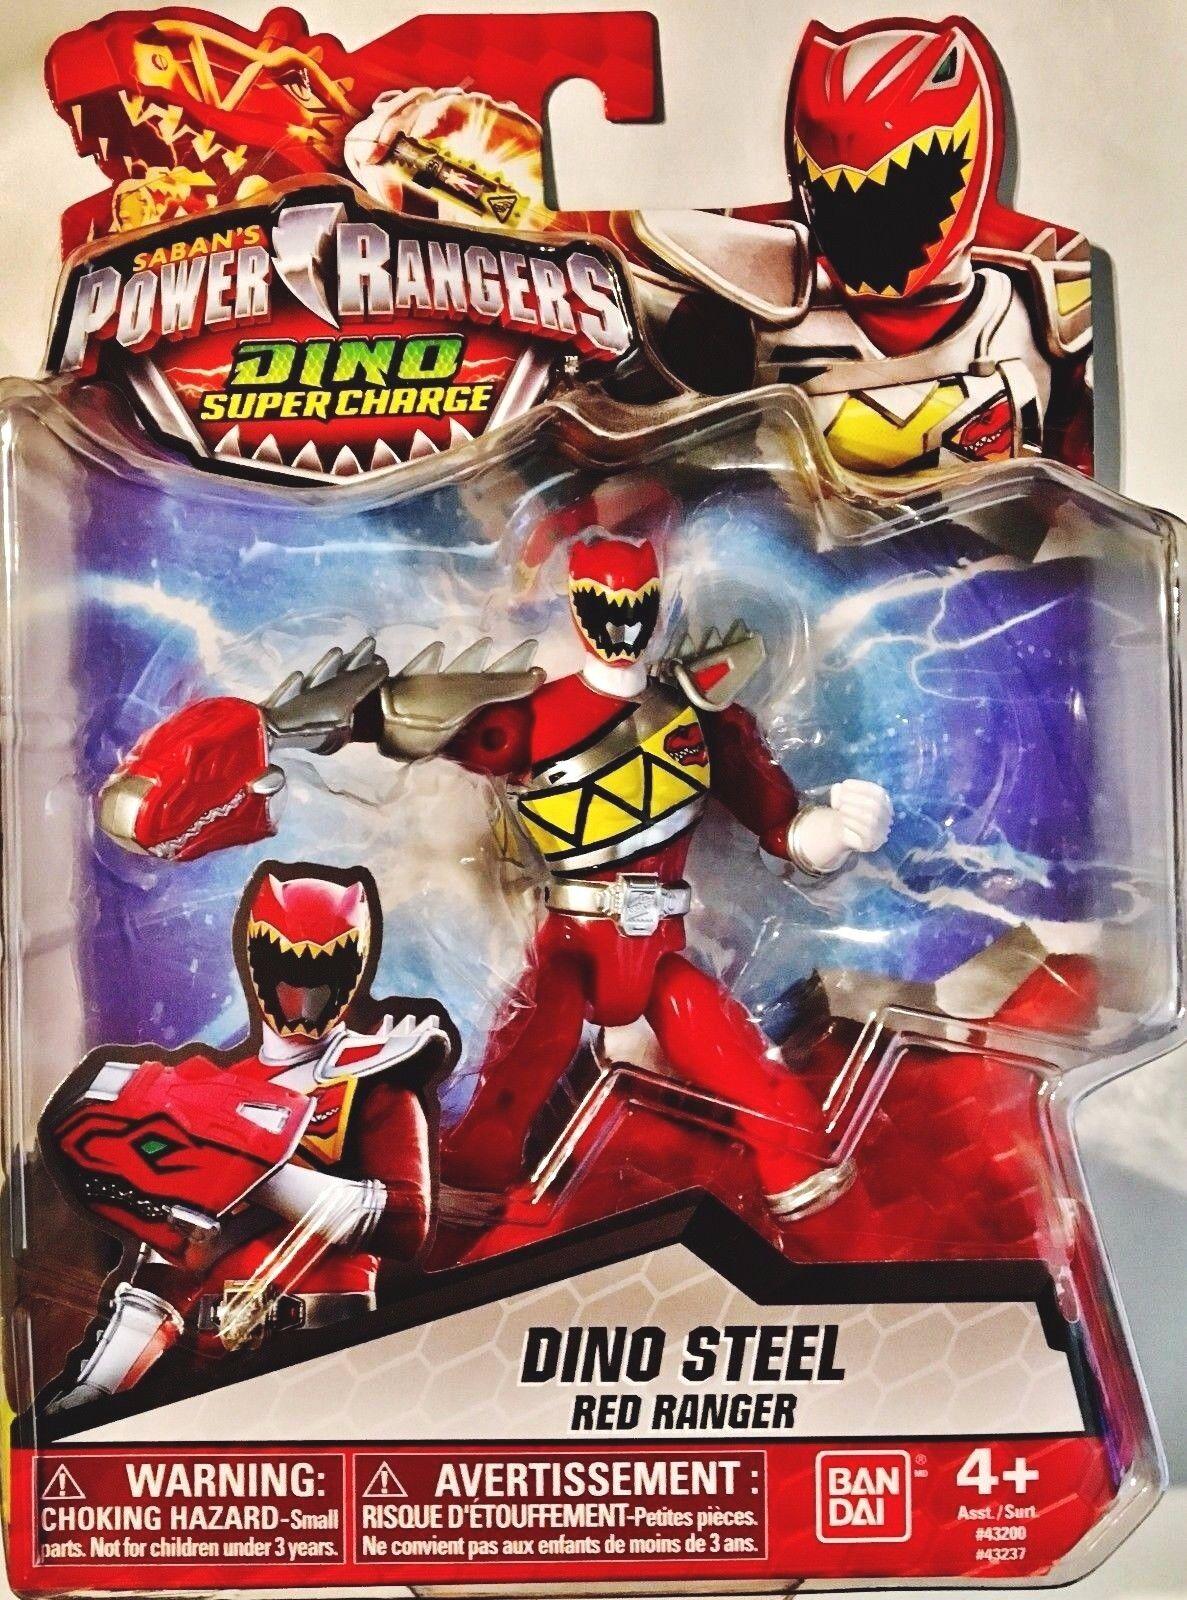 Power Rangers Dino Super Charge - Dino Steel Red Ranger